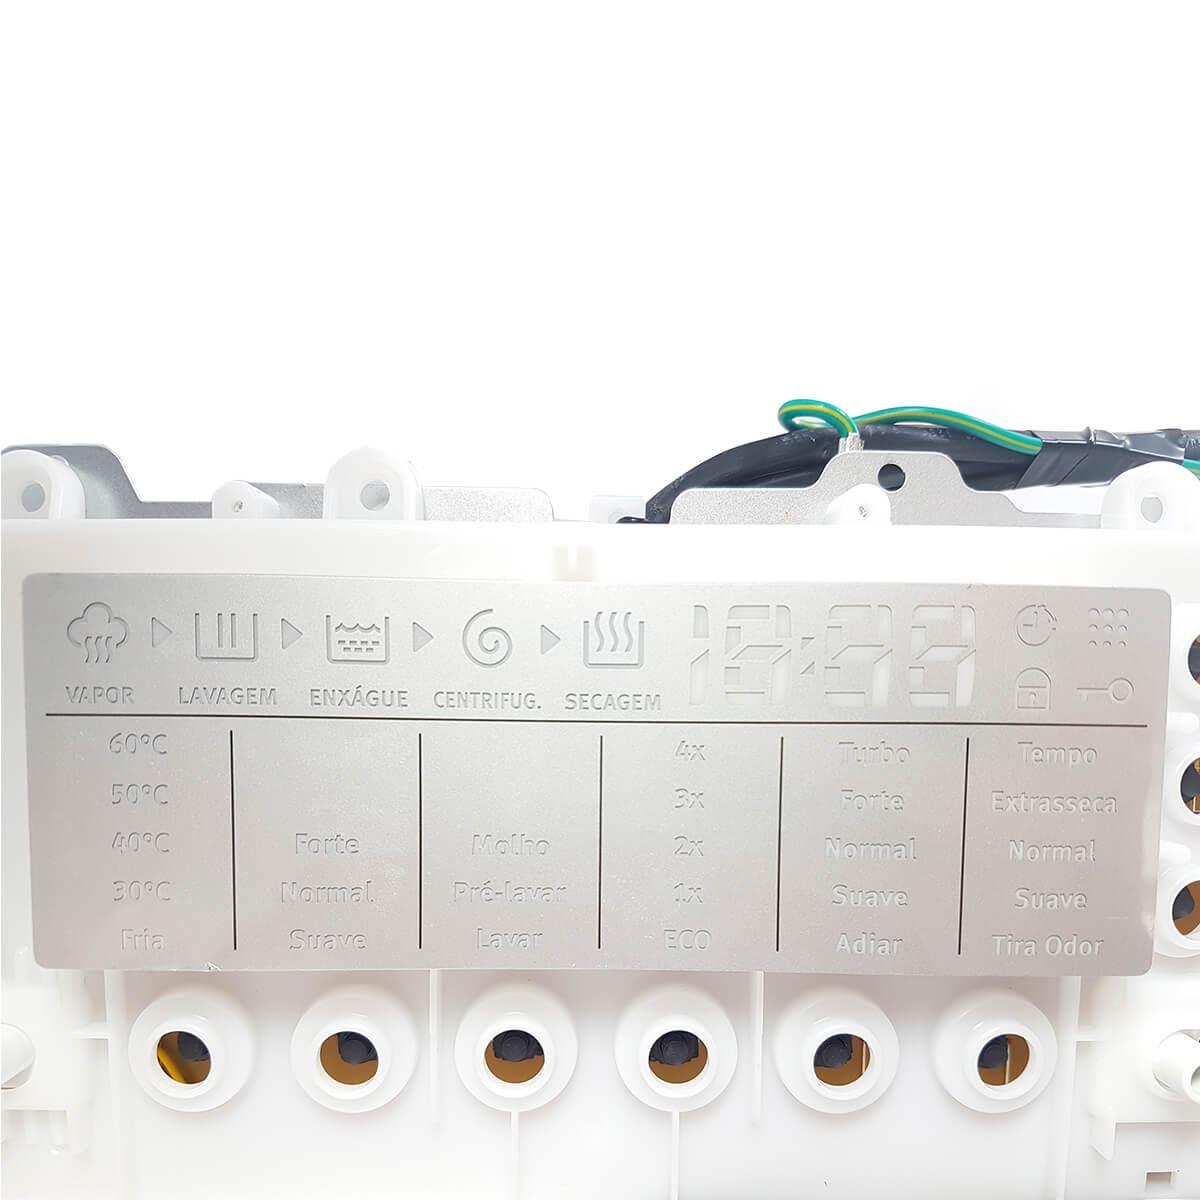 Placa De Controle Completa 127V Para Lava e Seca Electrolux LSE12 - PRPSSW2D3J